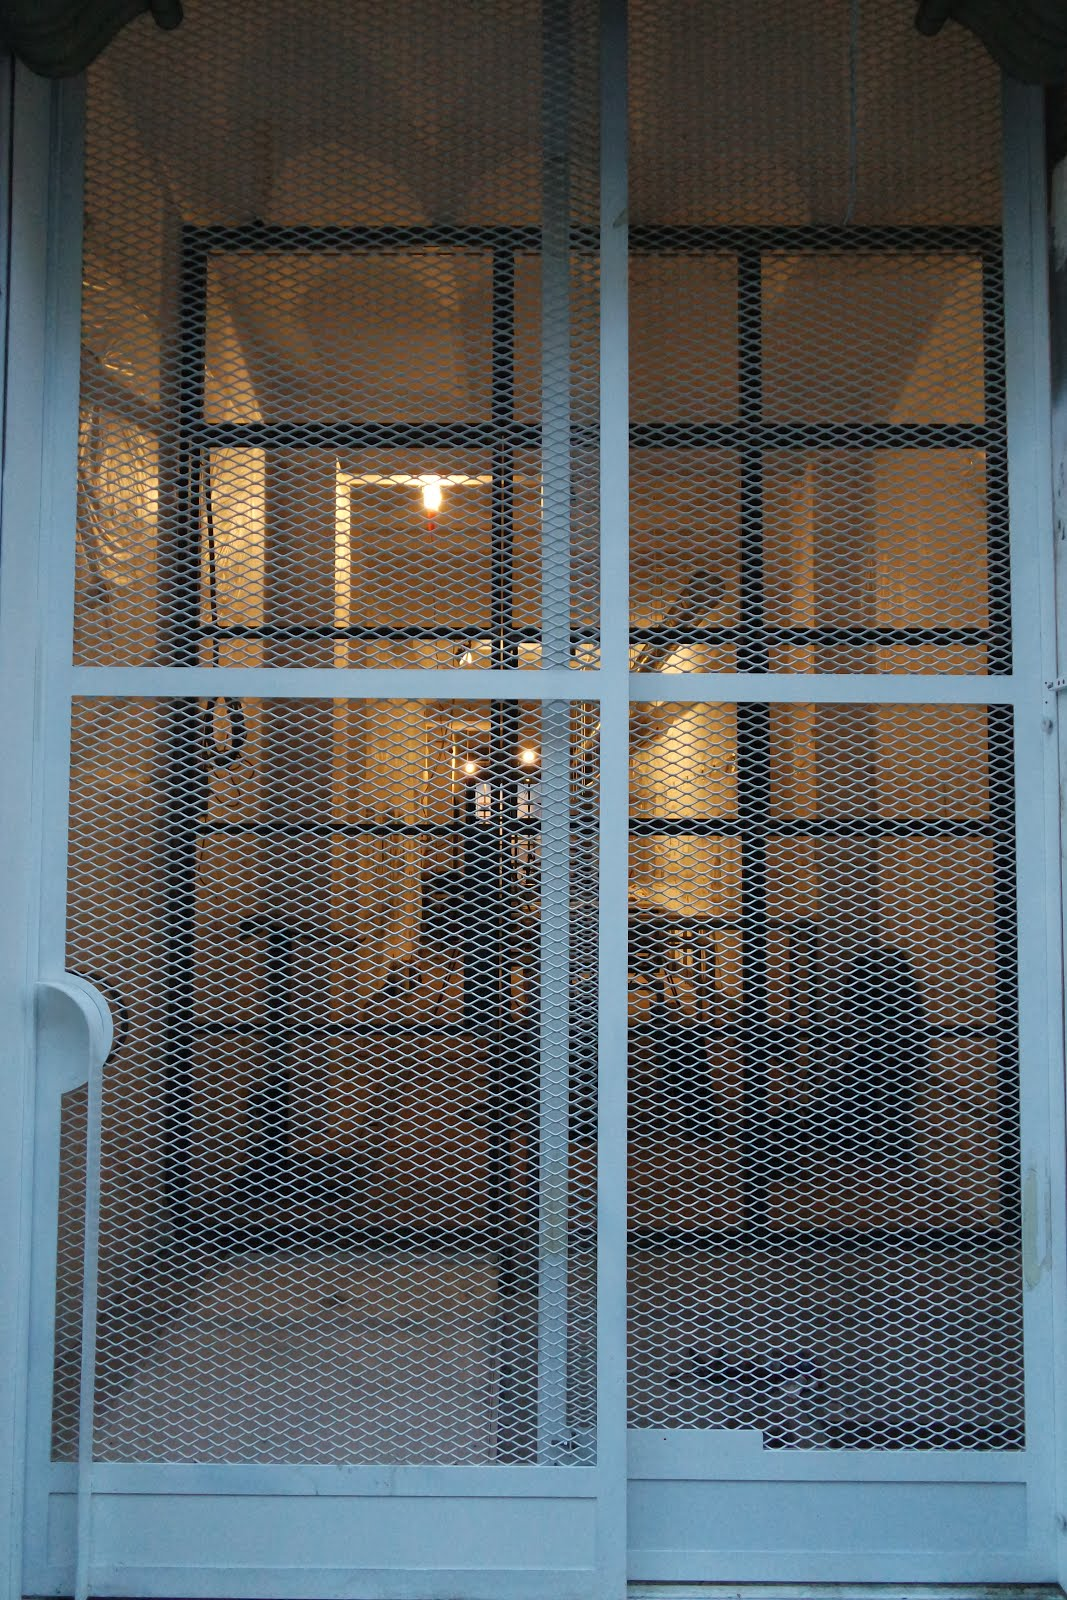 puertas de hierro zahor zahor iron gates zahor portes de fer zahor